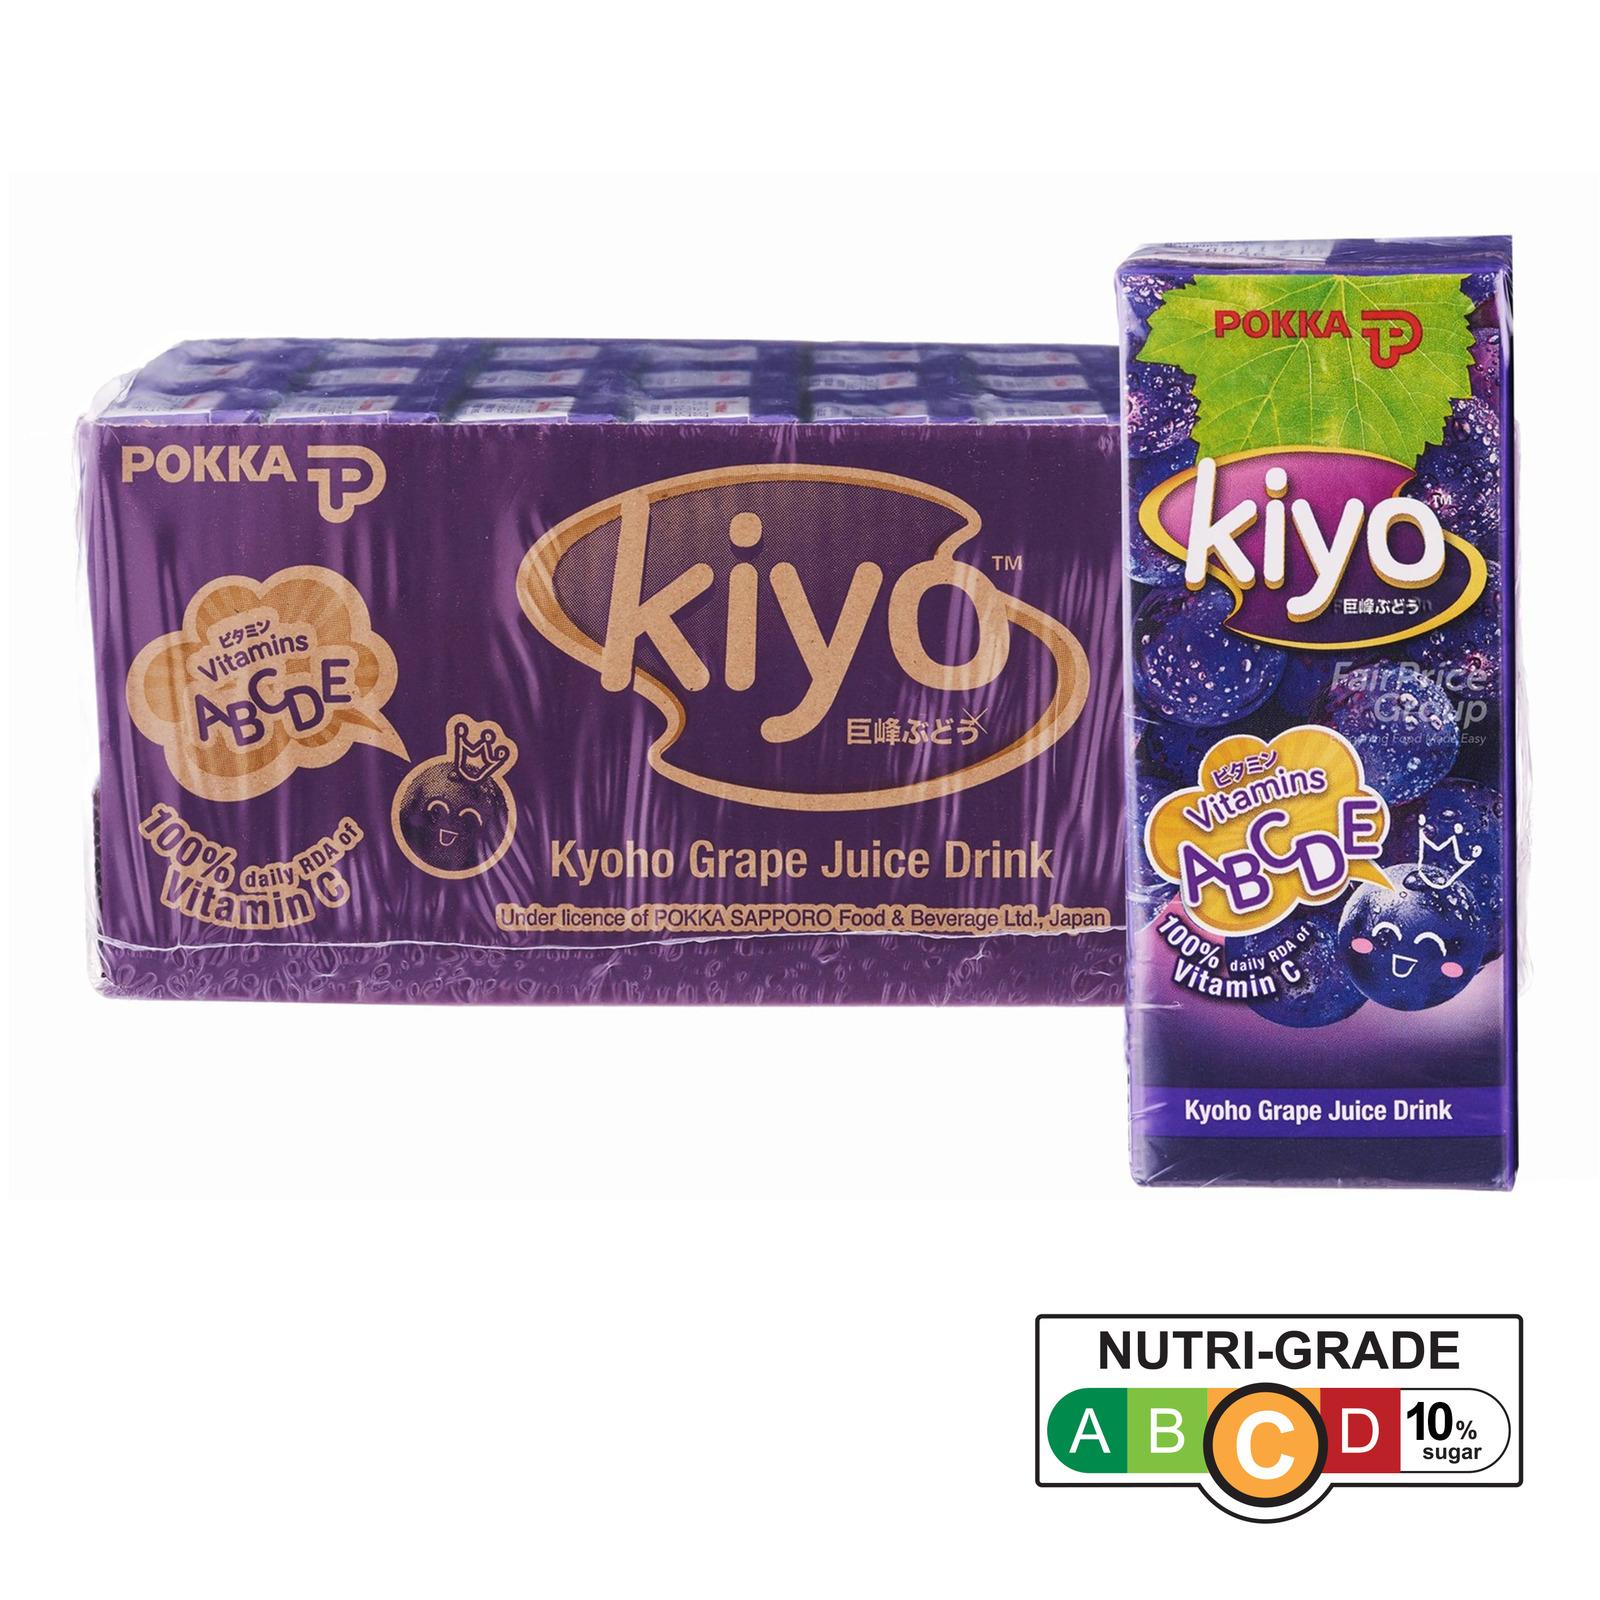 POKKA Kiyo Kyoho Grape Juice Drink 24sX250ml